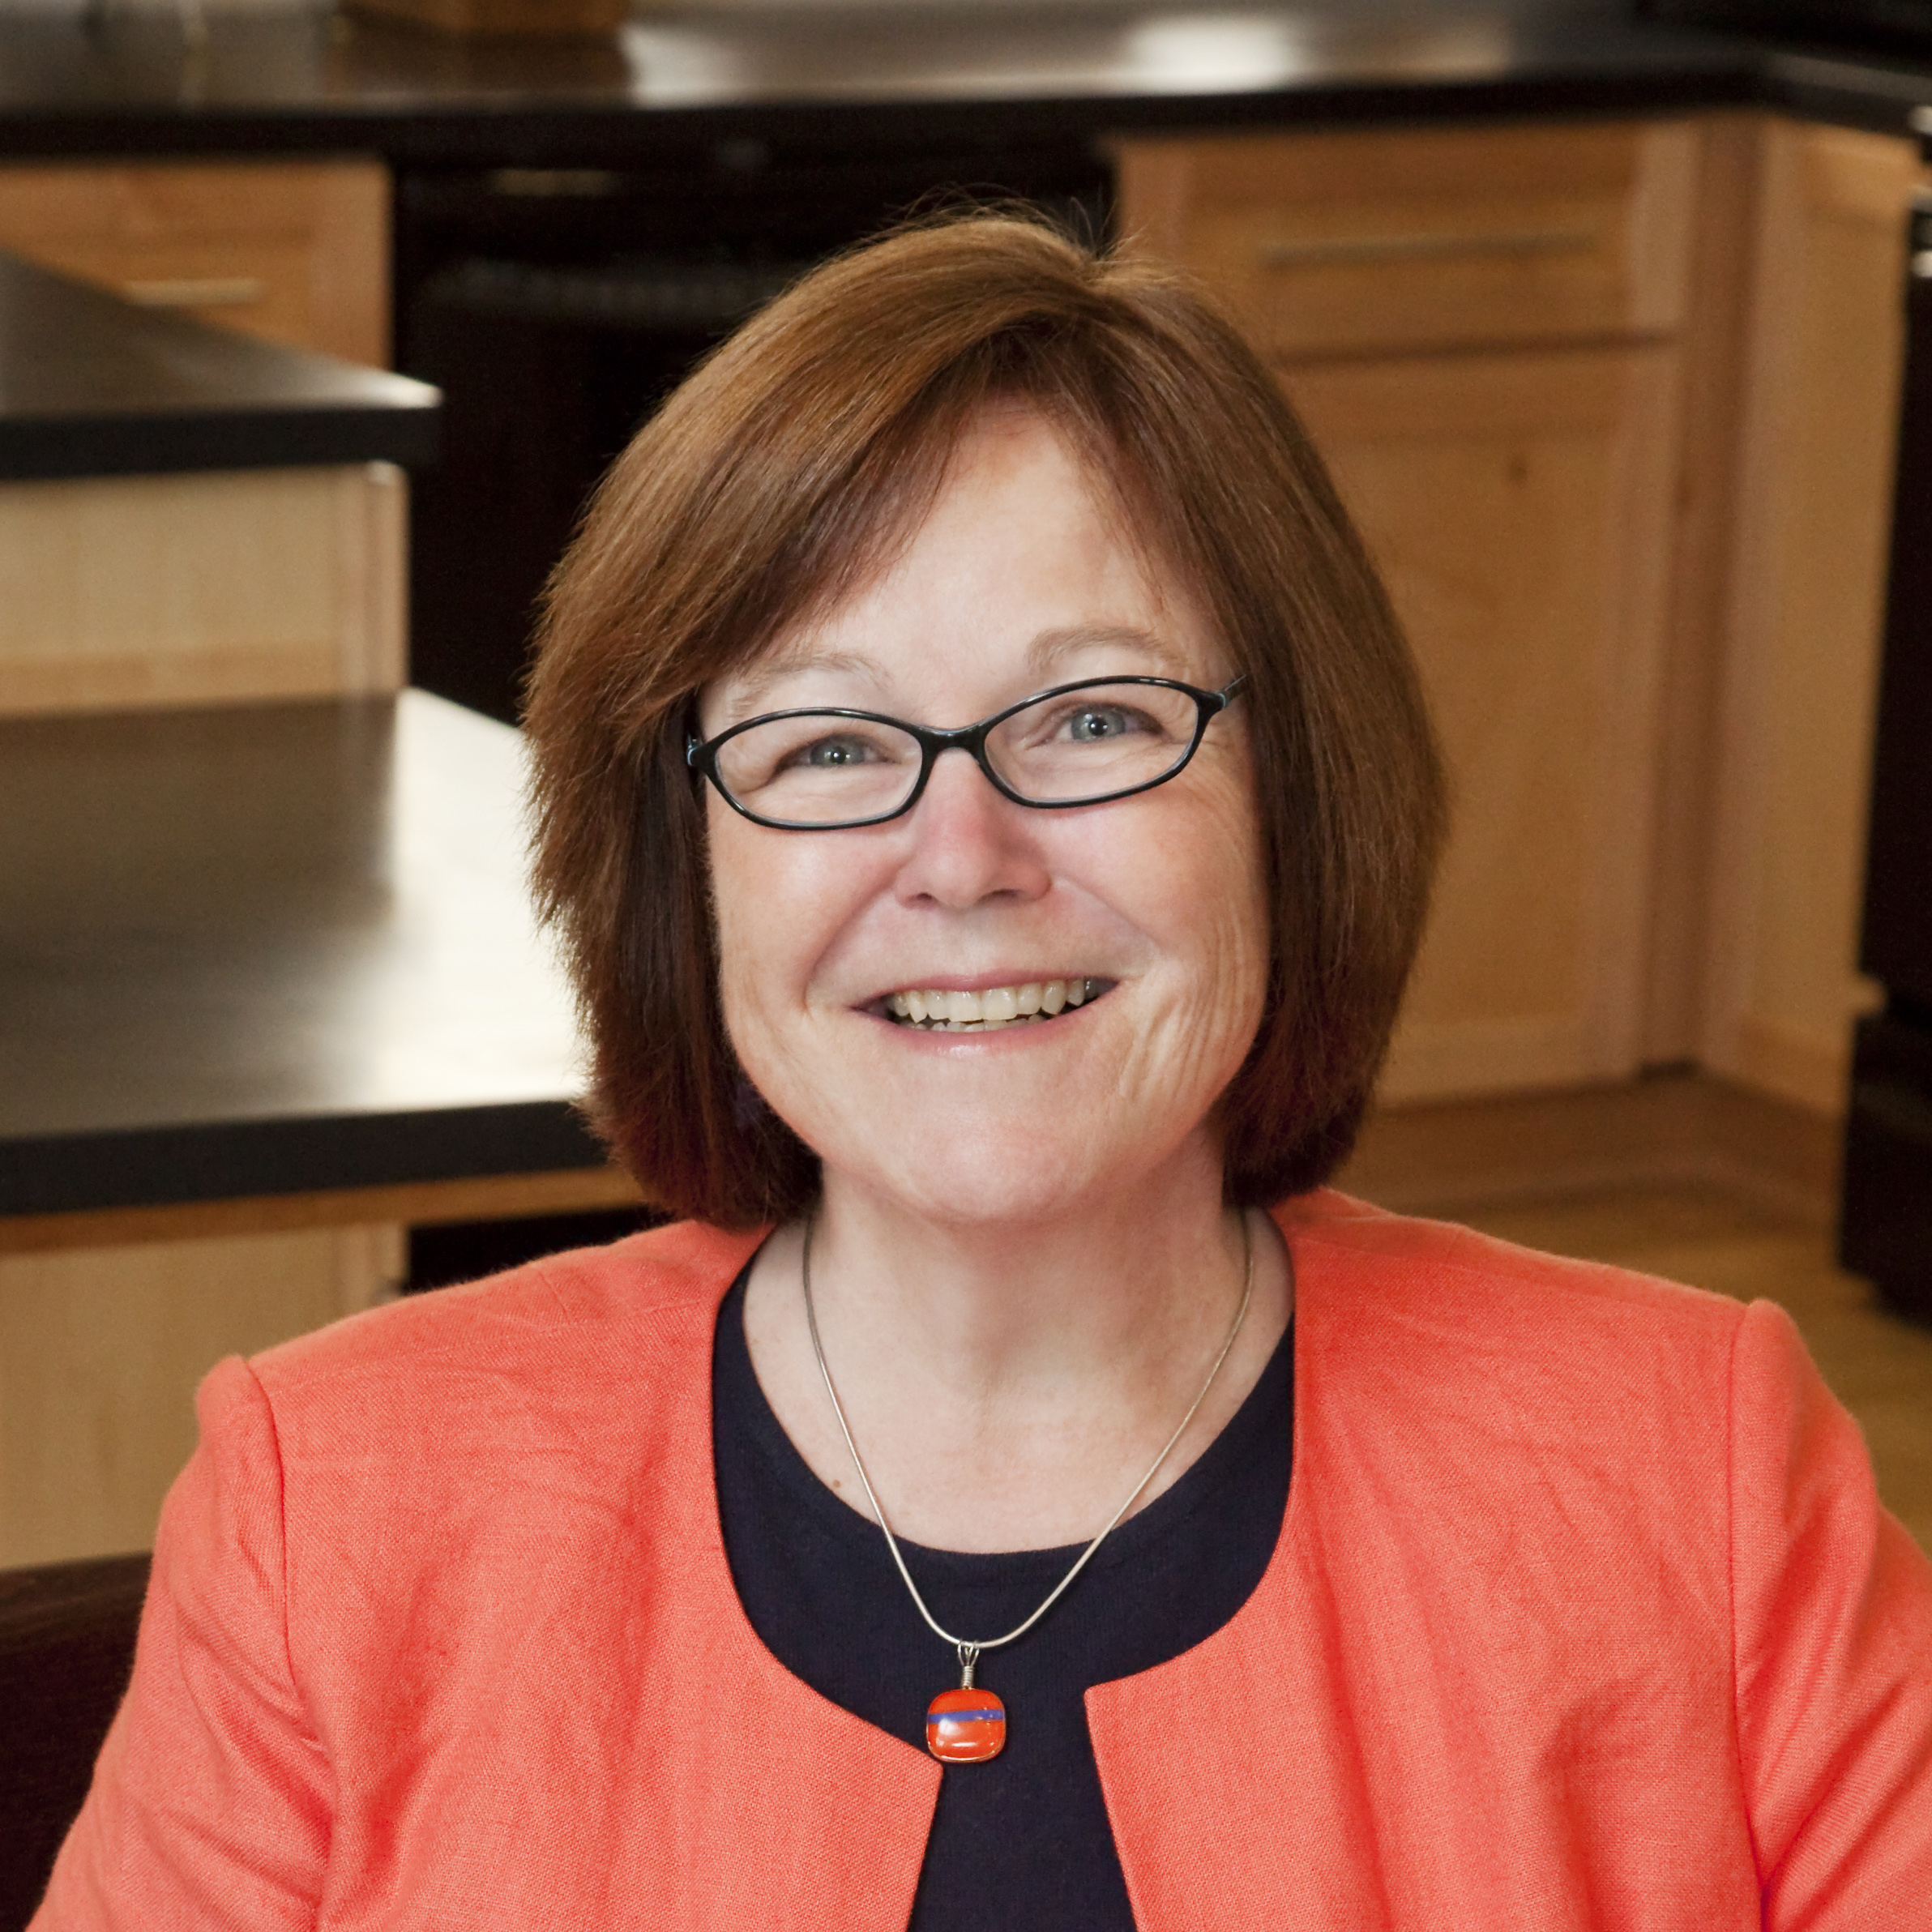 Barbara H. Fiese